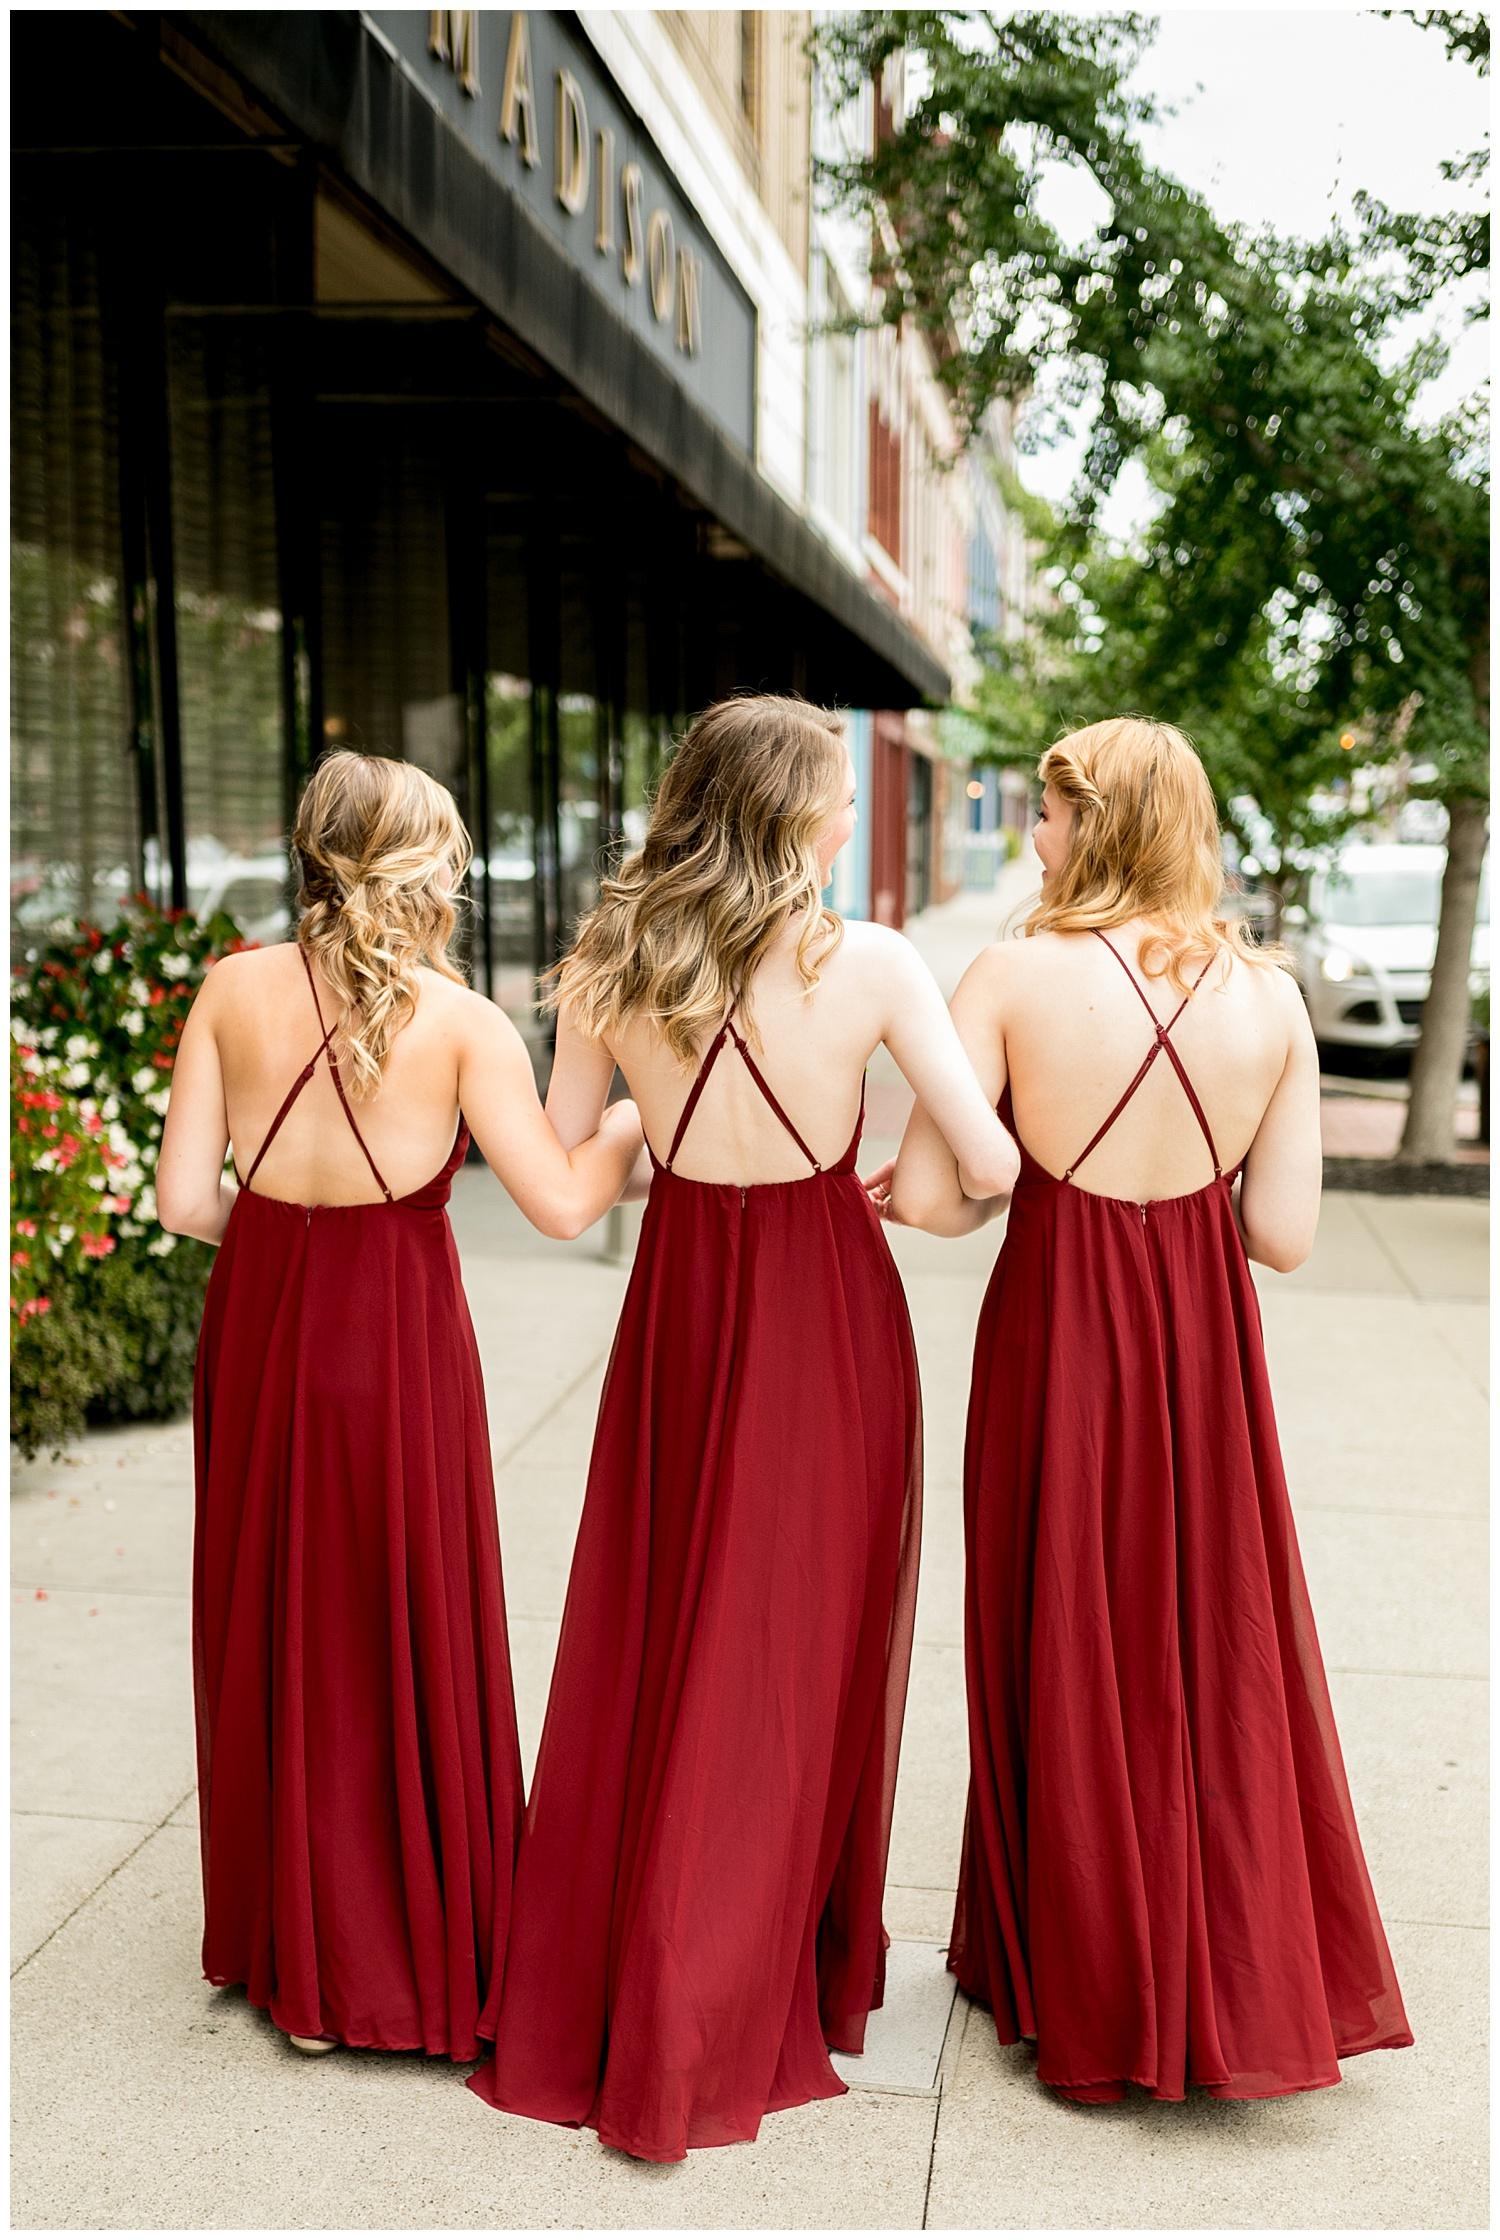 TheSmythCollective-Best-Cincinnati-Wedding-Photographer-Urban-Downtown-Covington-Wedding-13.jpg